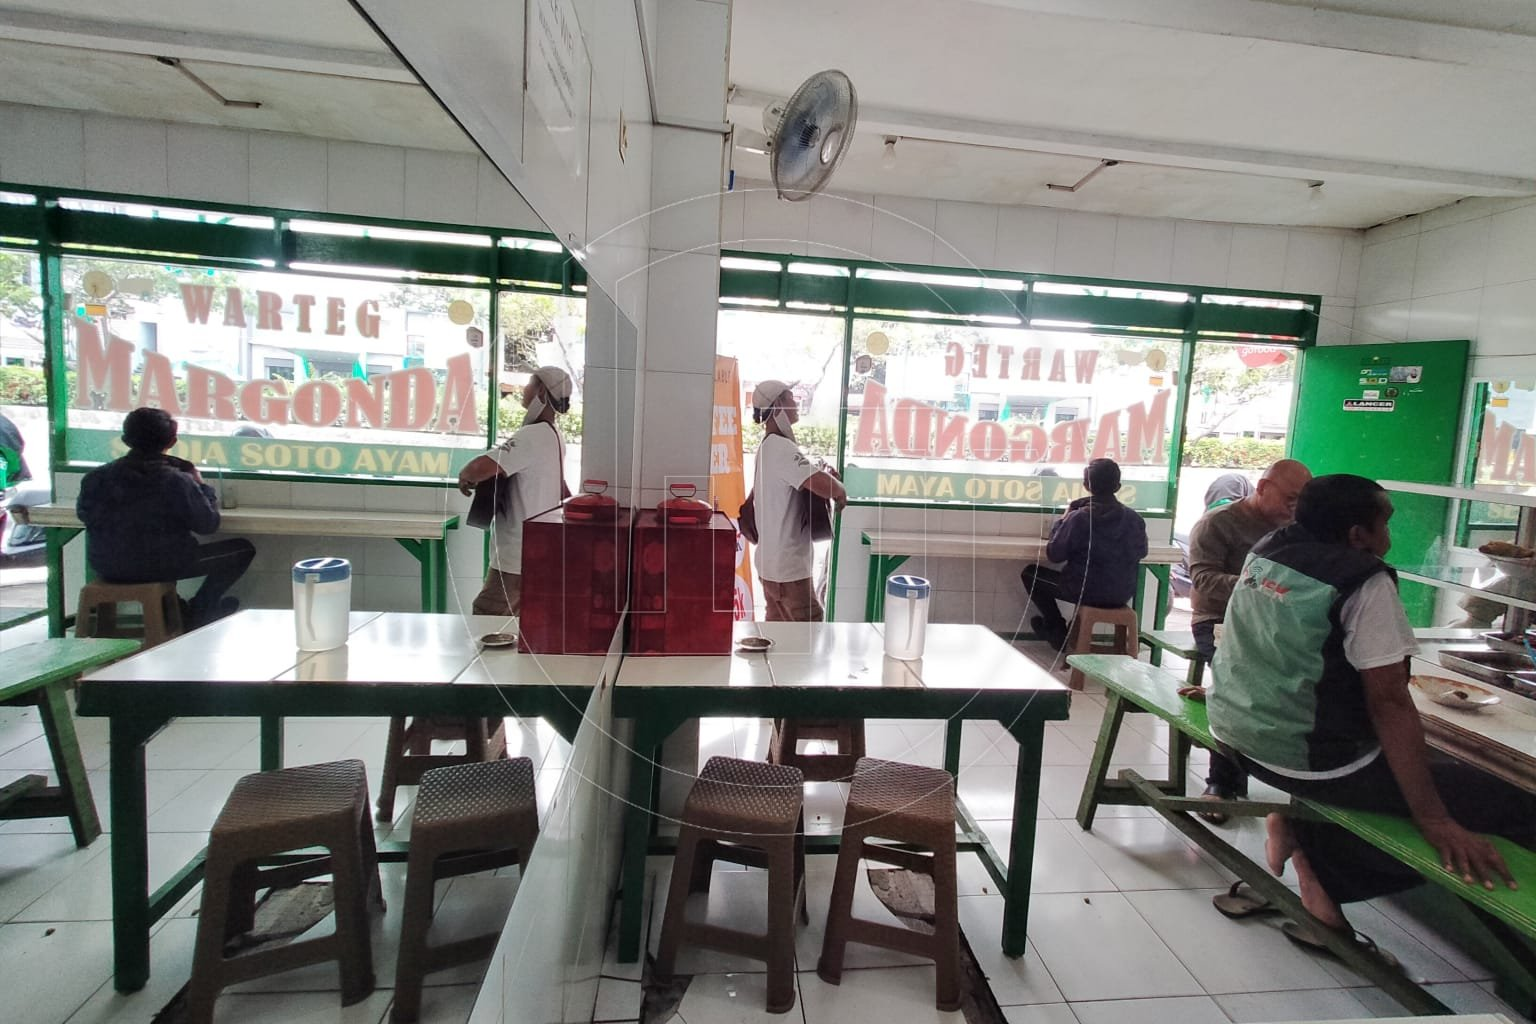 PPKM Level 3 di Depok Memperbolehkan Dine In 30 Menit